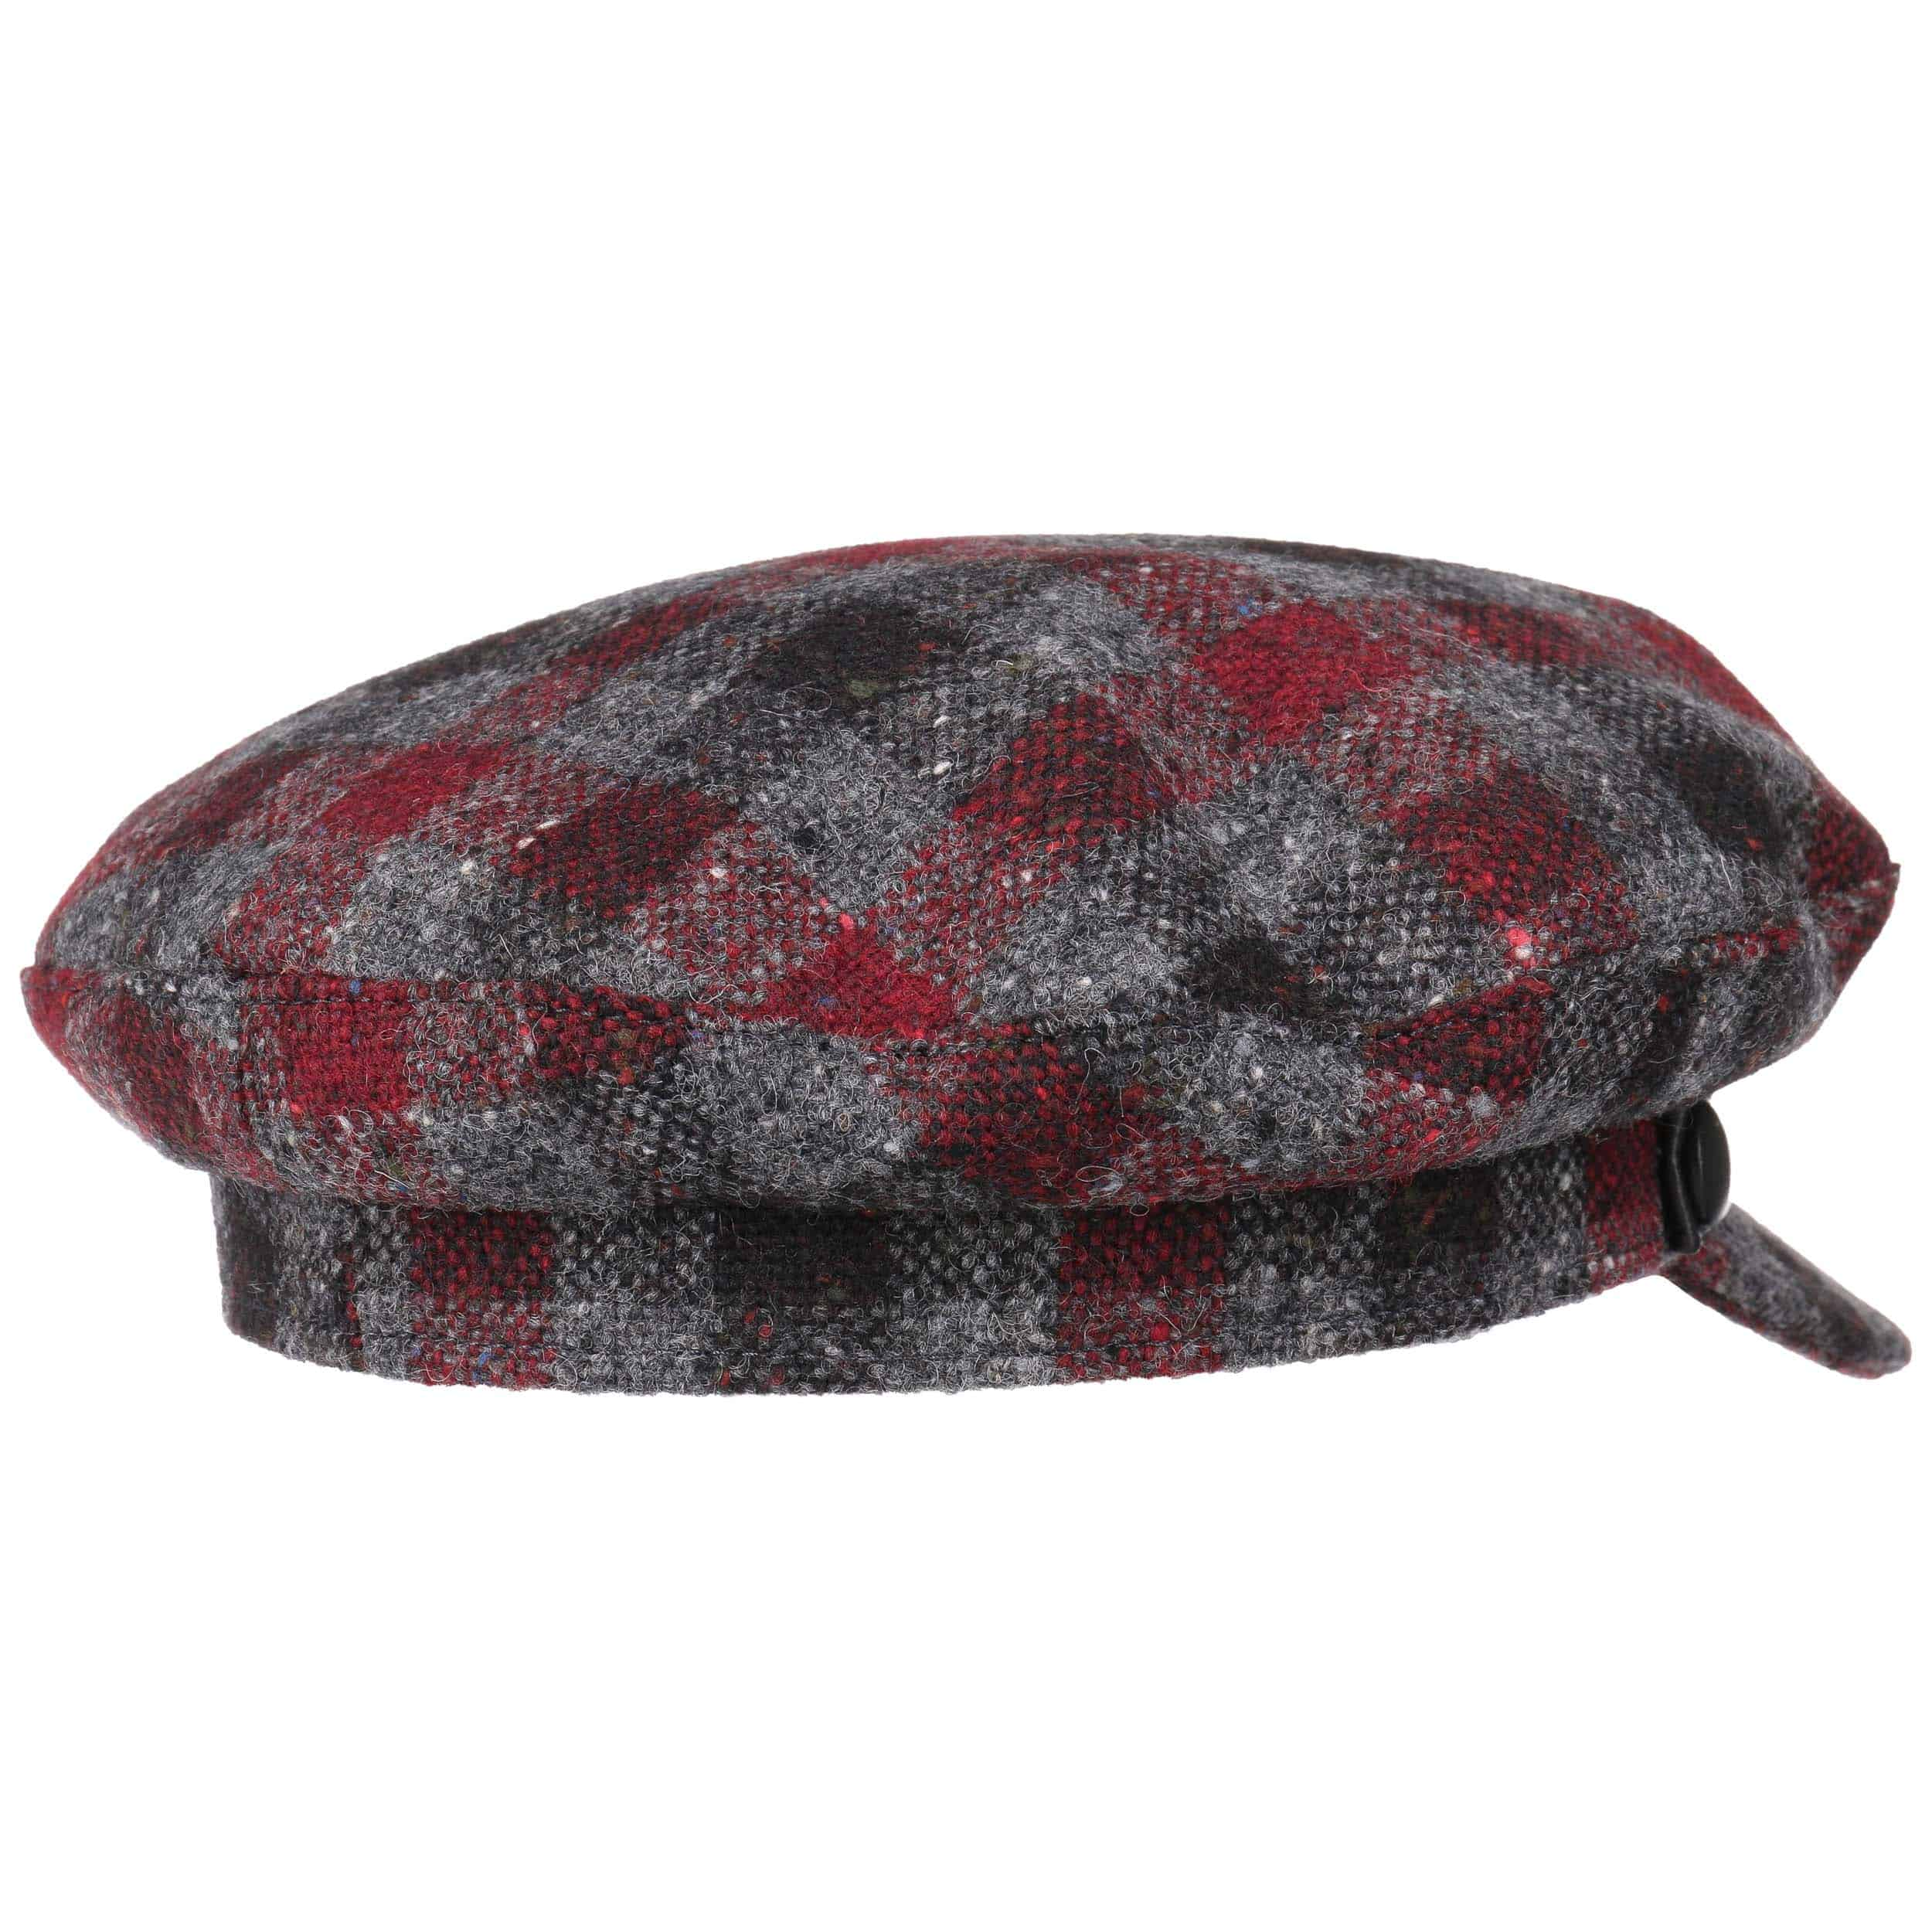 ... Cappello Baker Boy a Quadri by Lierys - grigio-rosso 3 ... 5cf8a1bcf53f